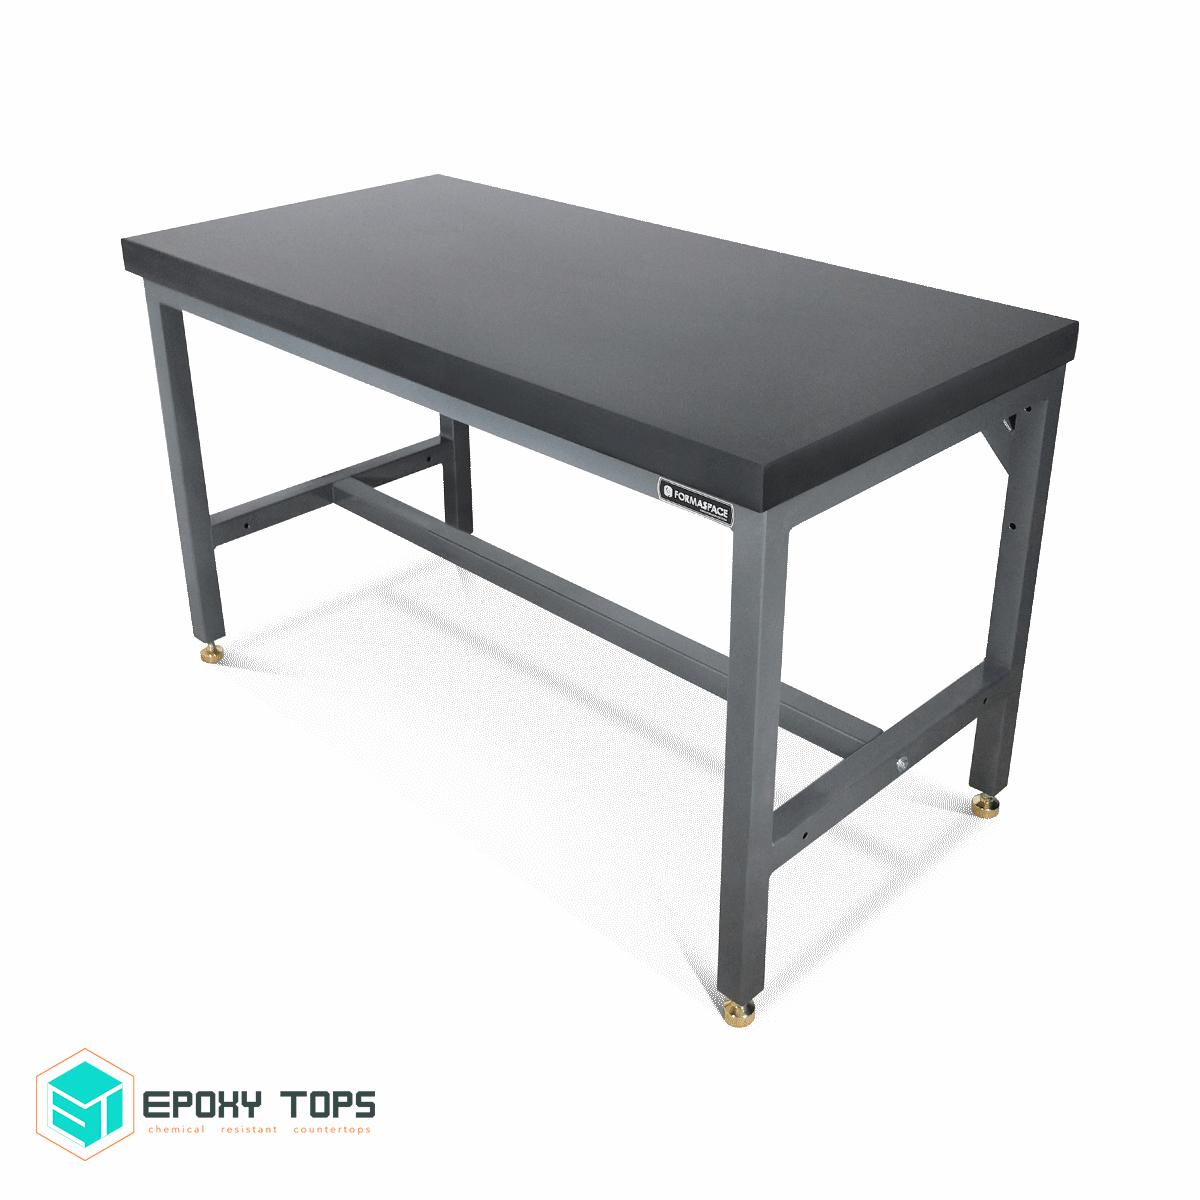 "2.5"" Black Epoxy Tops Balance Table"